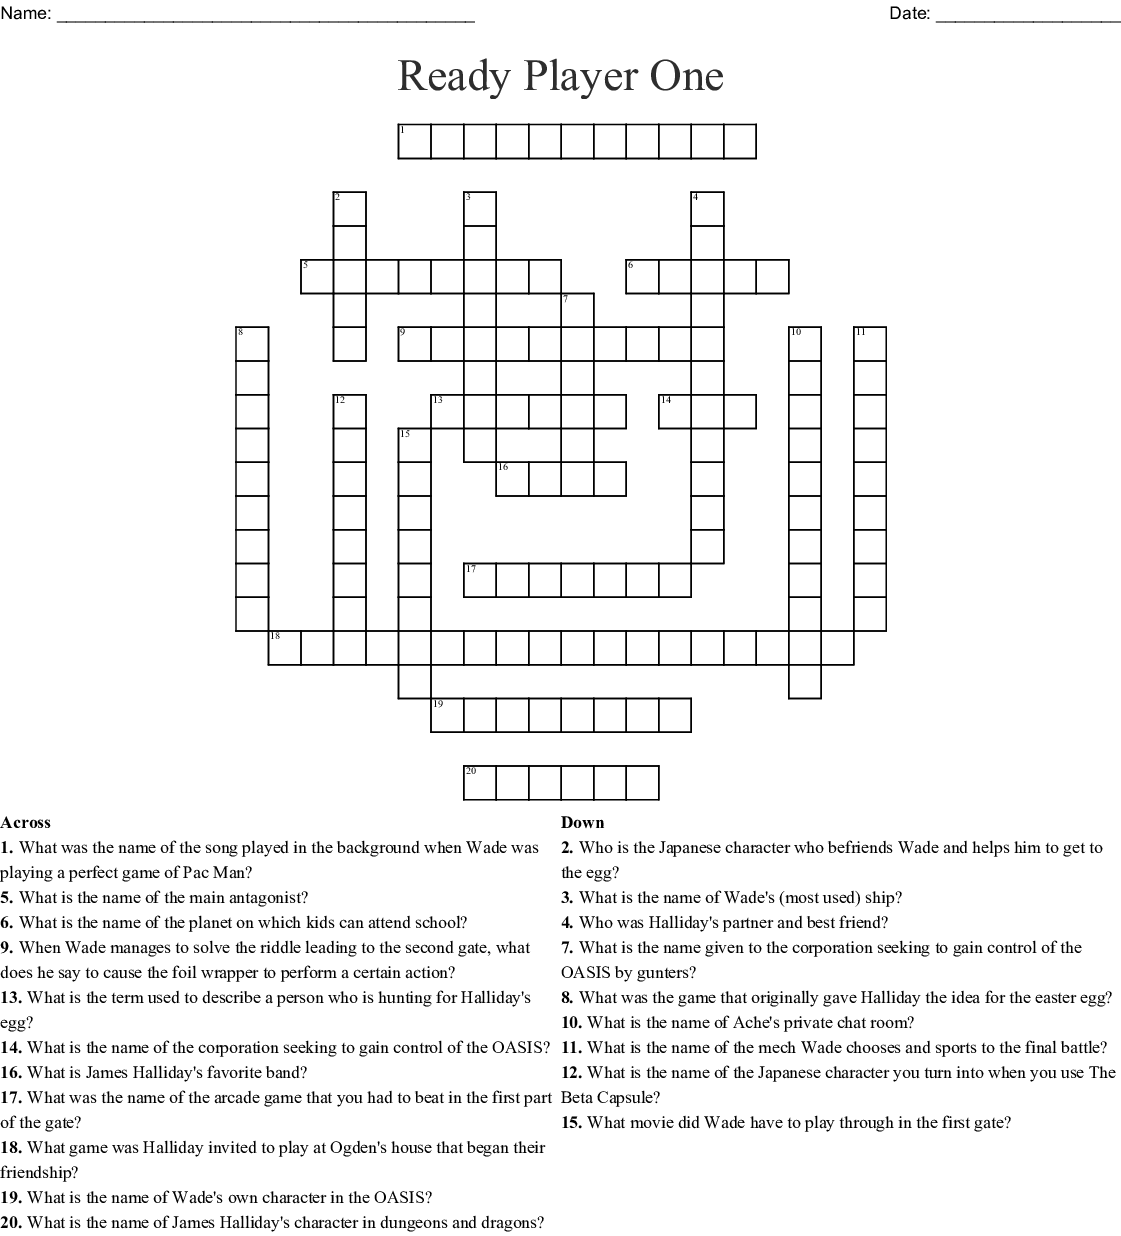 Ready Player One Crossword Wordmint